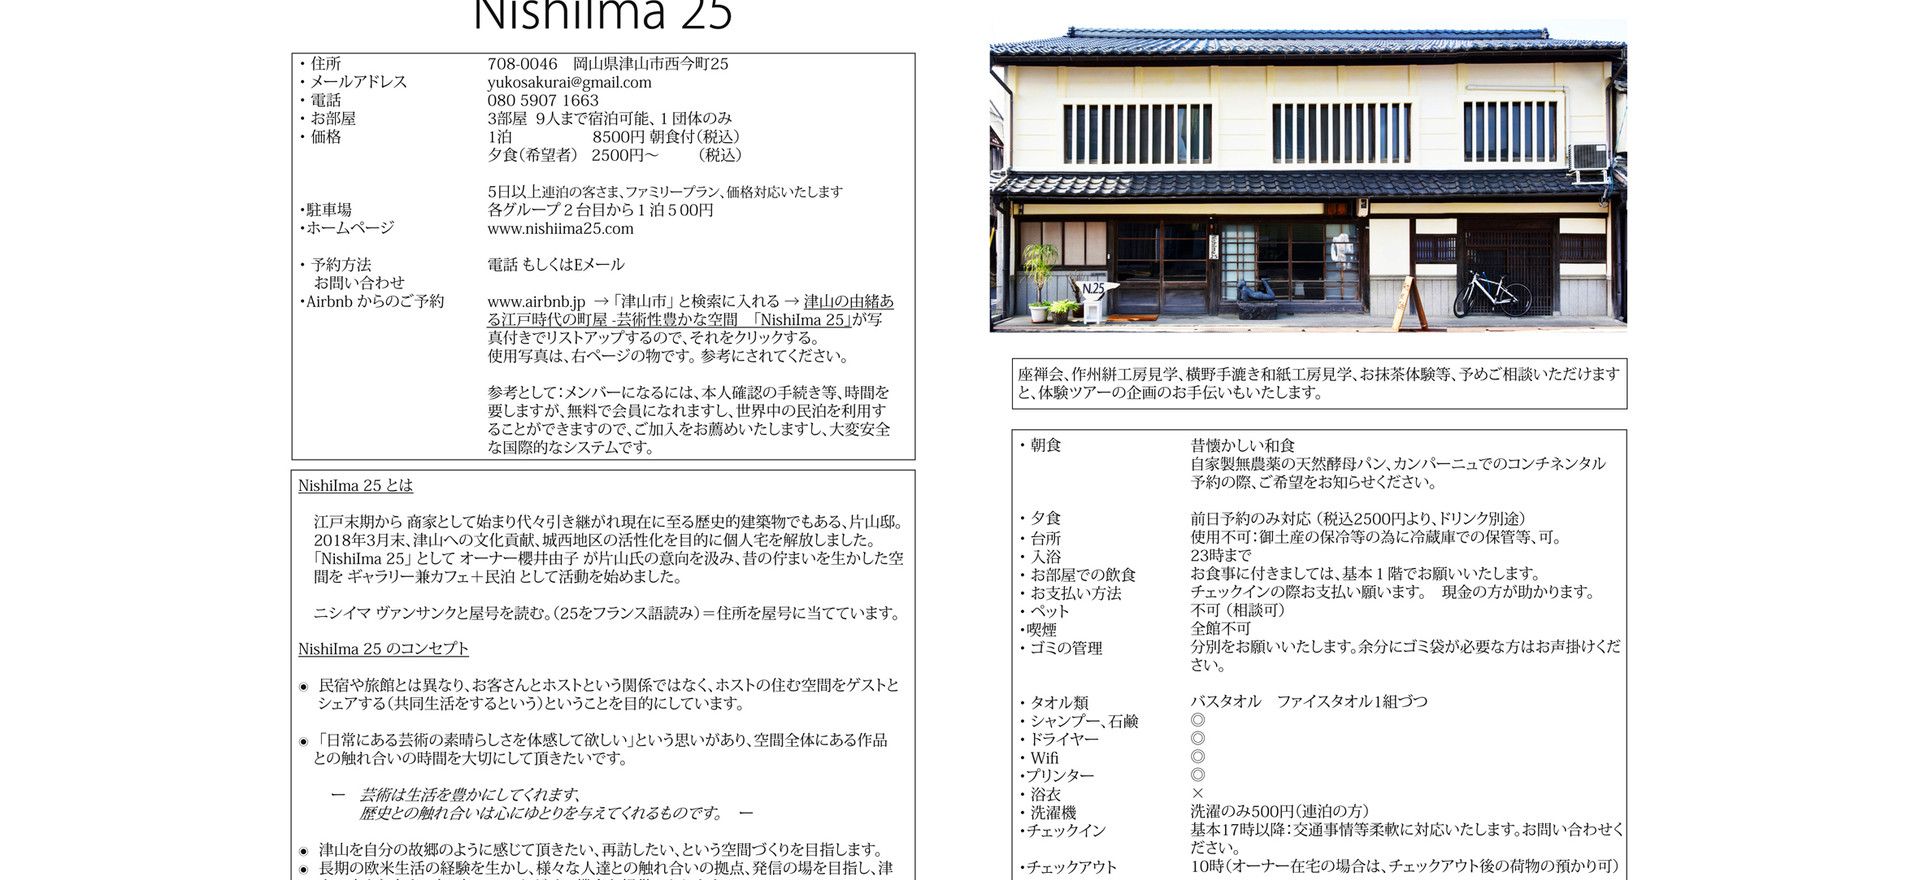 Nihongo info